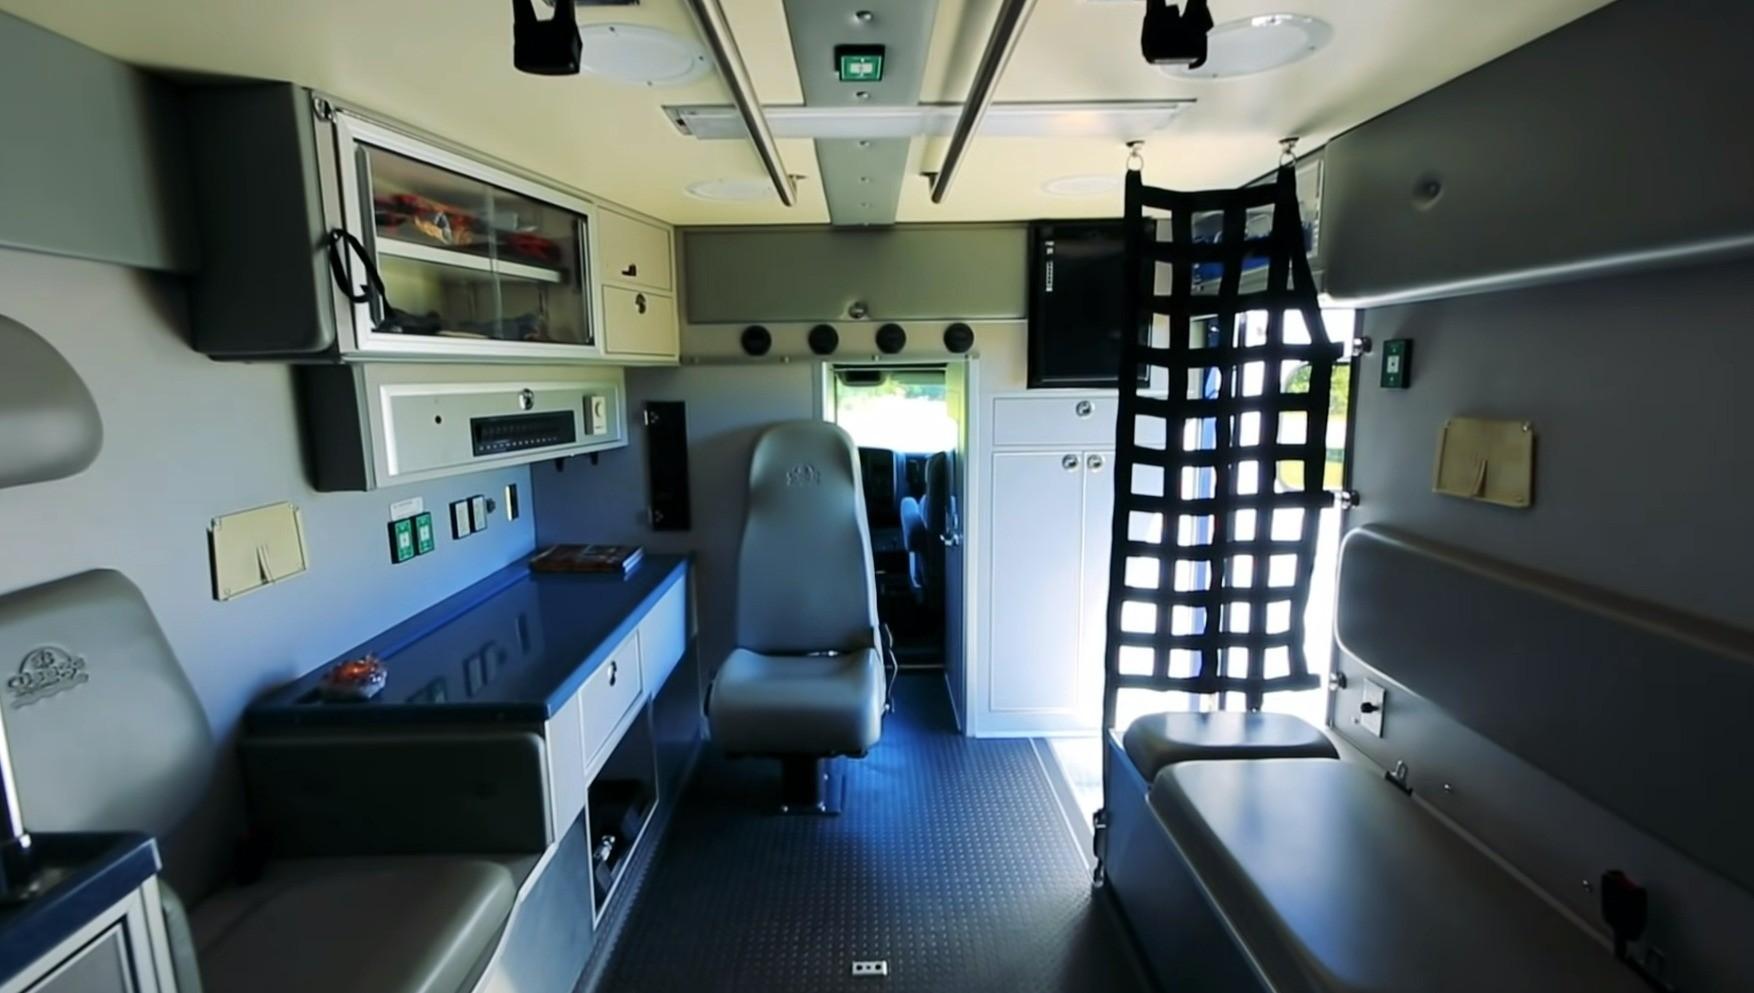 Campulance interior